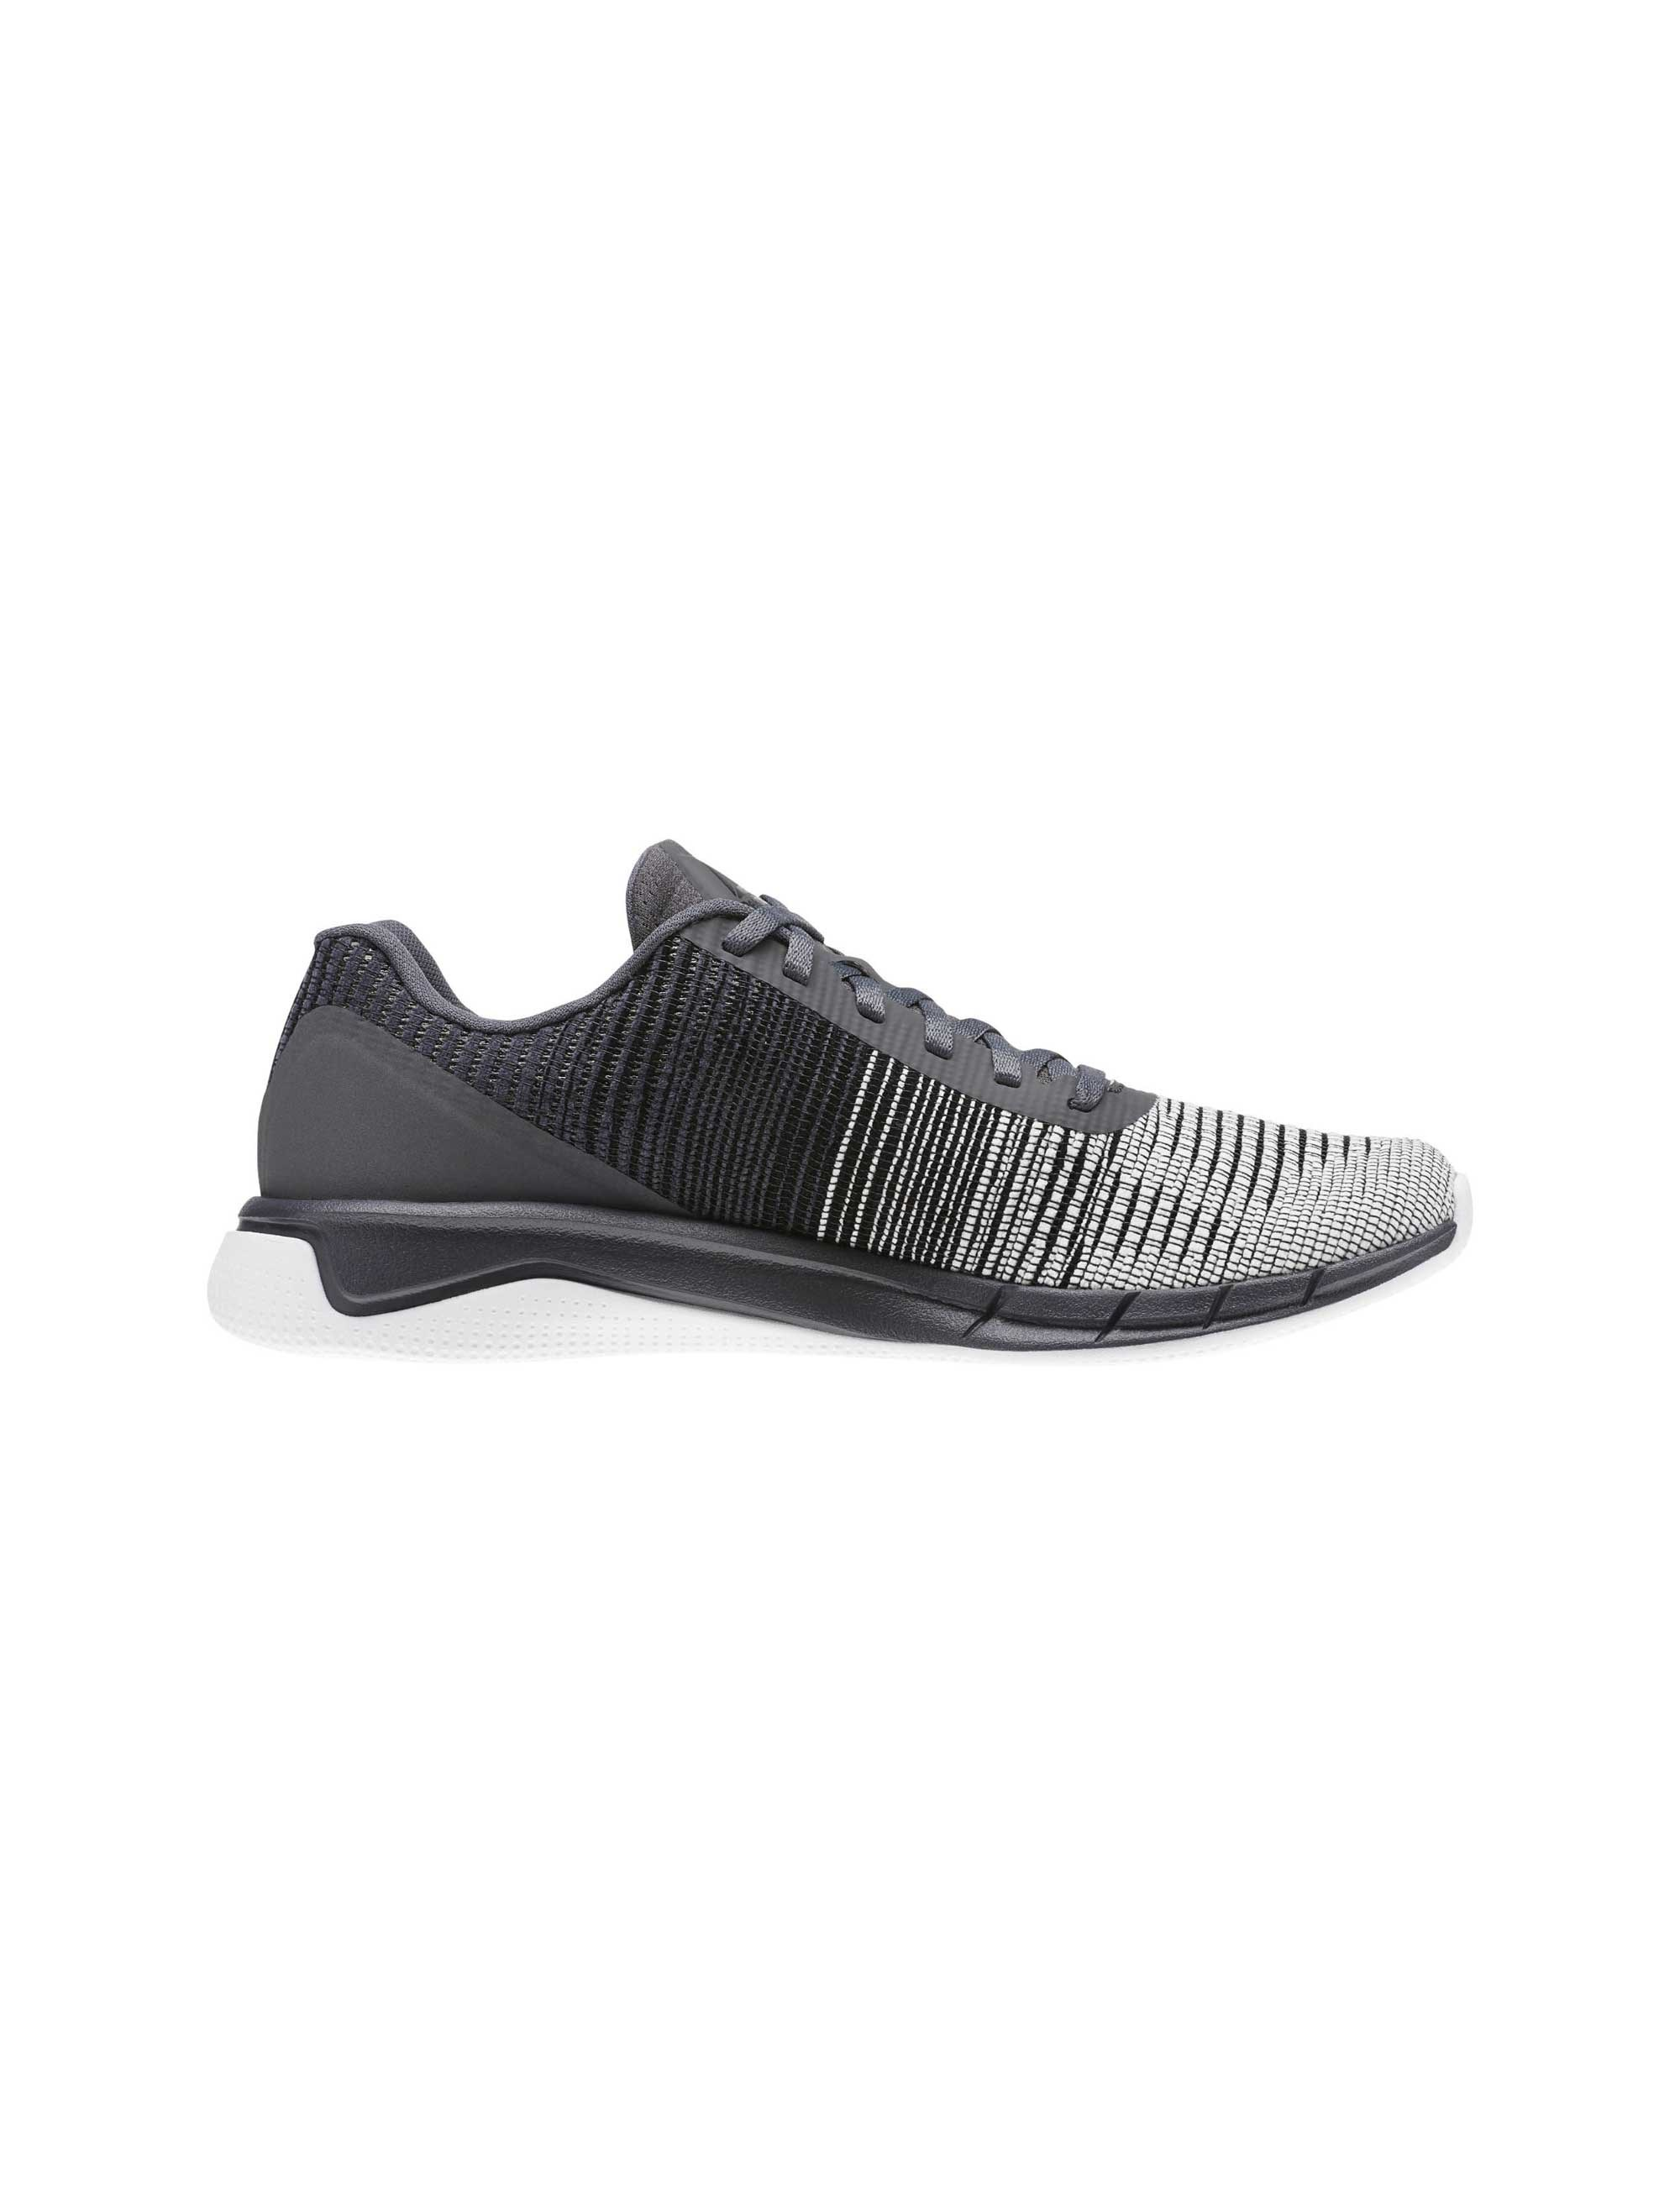 قیمت کفش دویدن بندی مردانه Fast Flexweave - ریباک